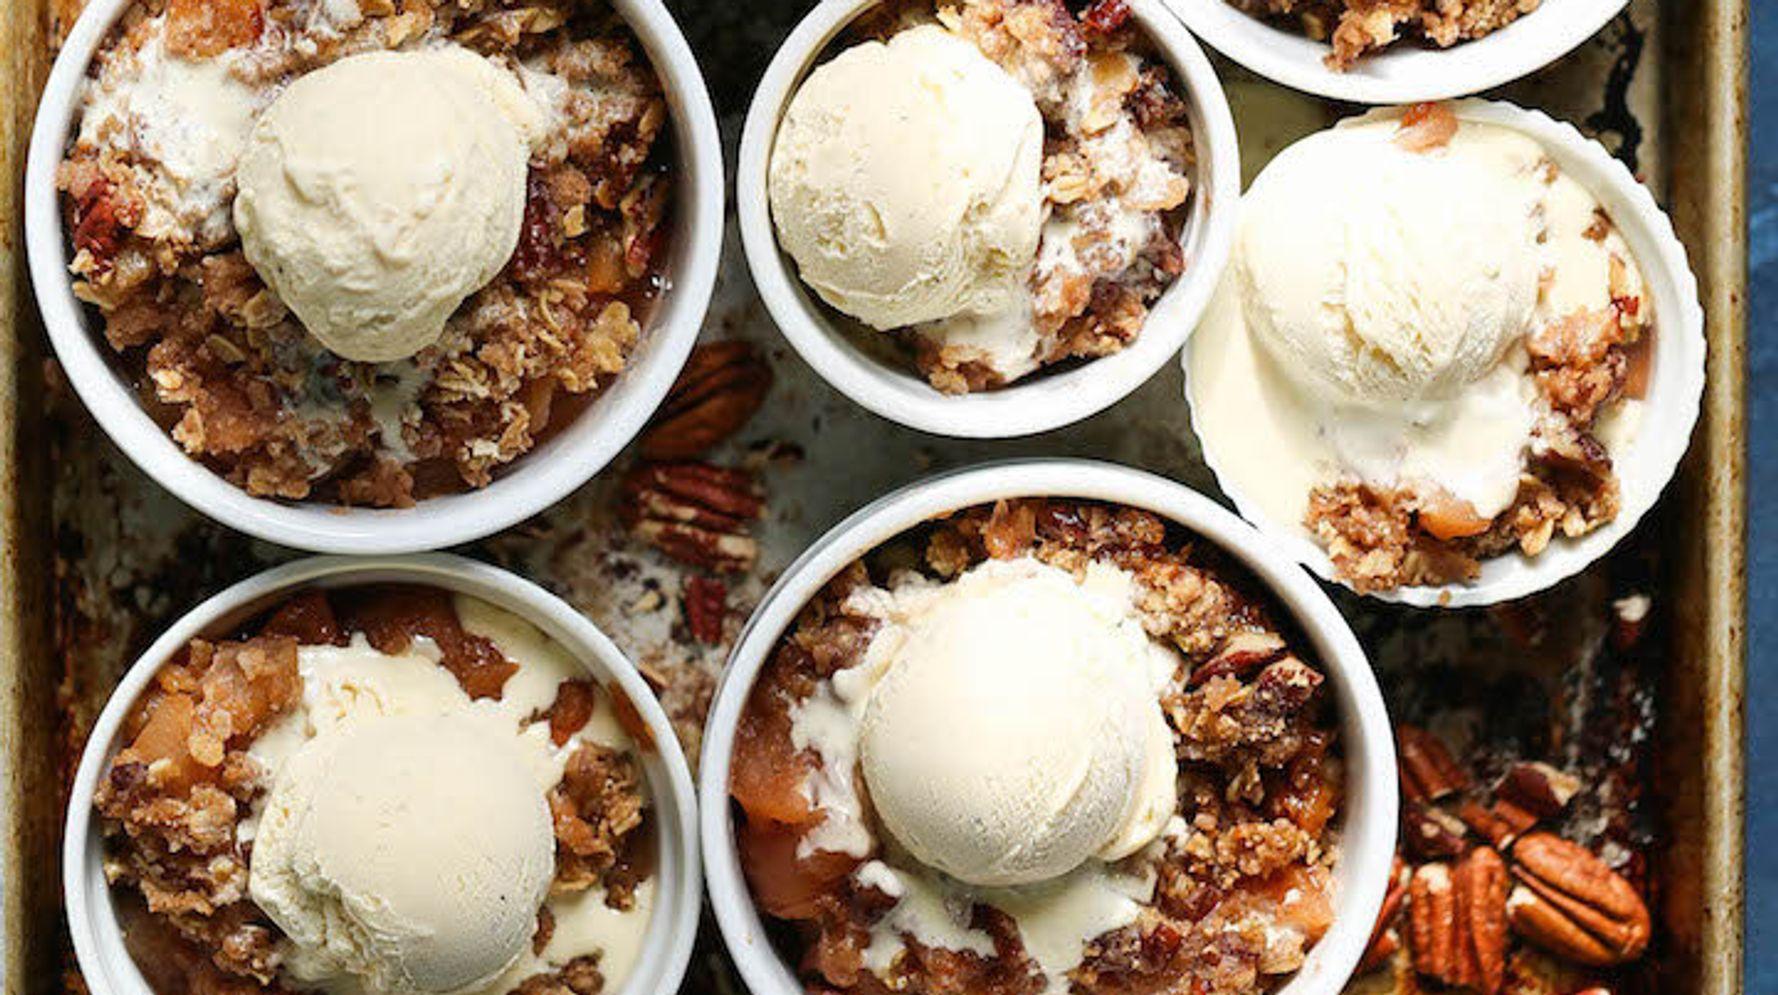 Hate Making Pie Crust? Make These Fruit Crisp Recipes Instead photo